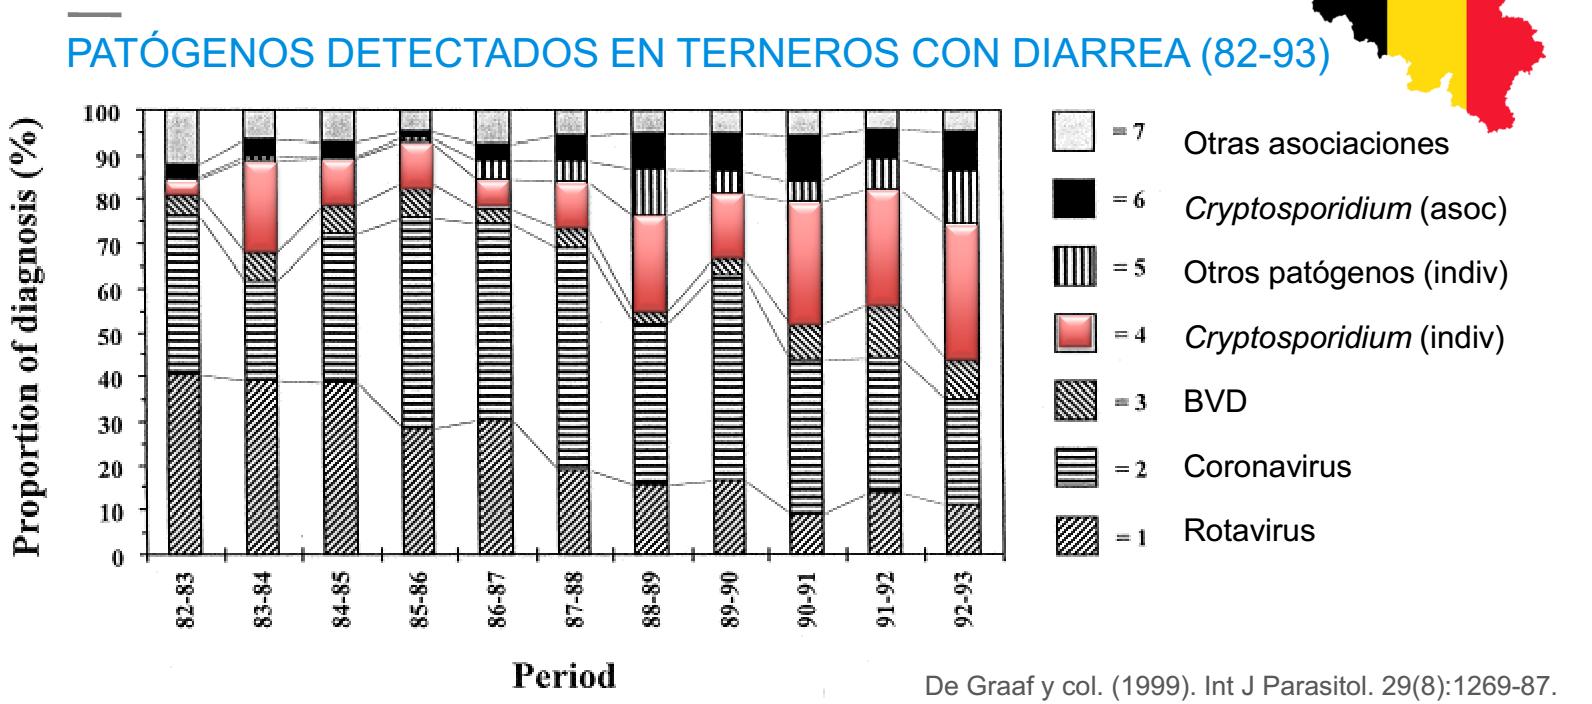 DIARREA BECERROS PABLO DIAZ 4